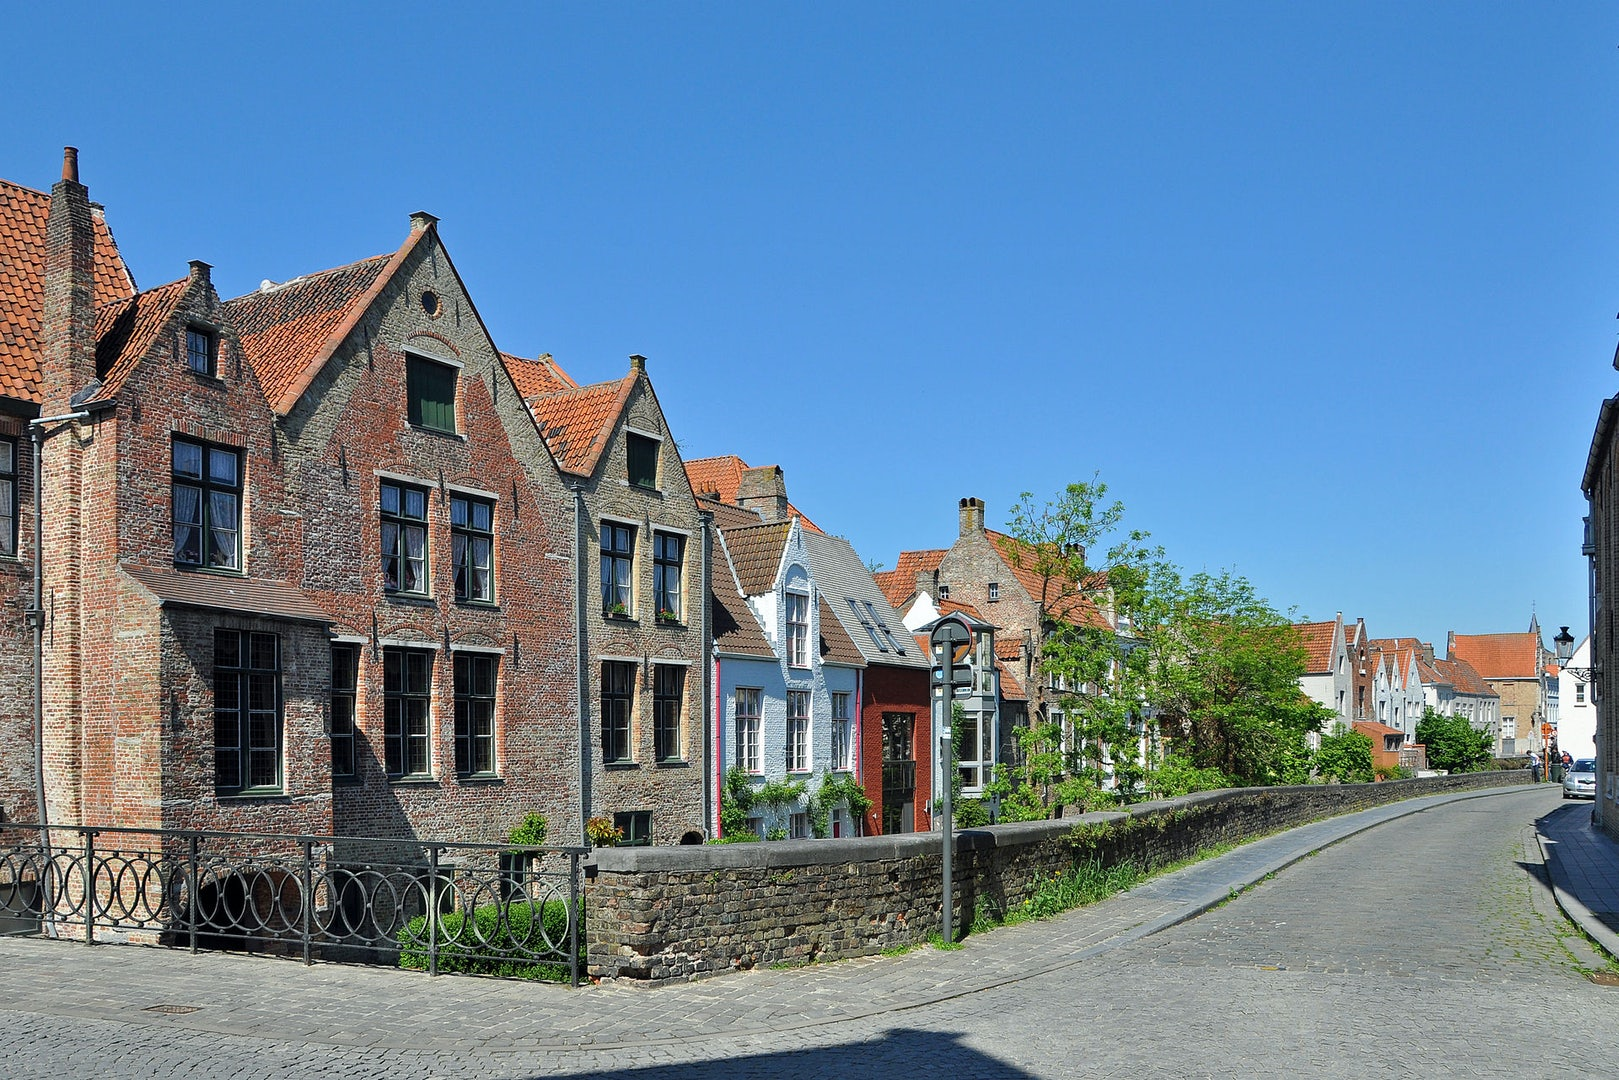 Grauwwerkersstraat Gardens